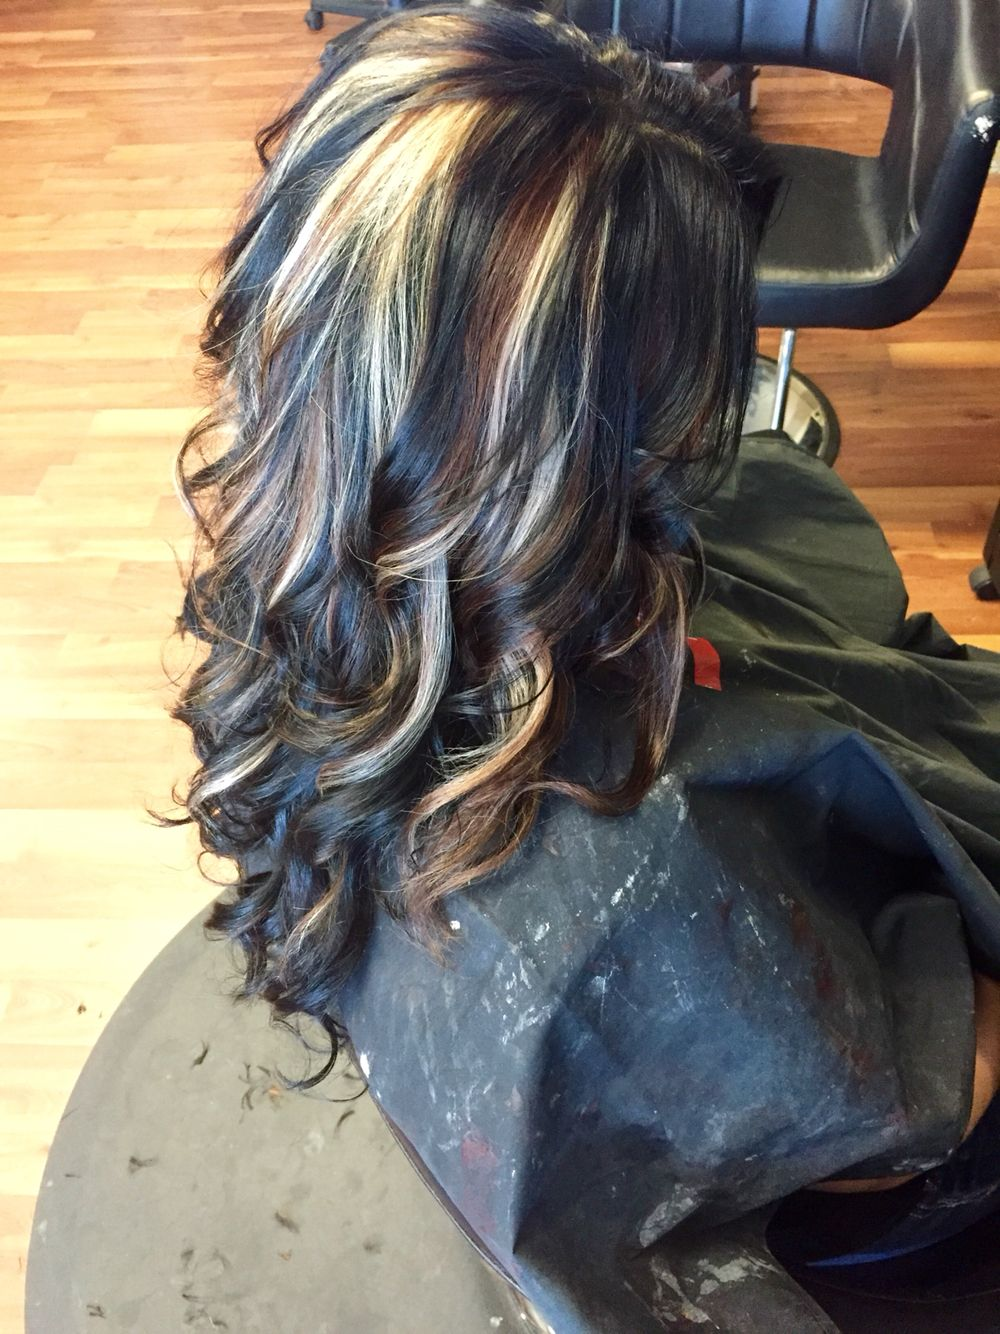 All Over Black With Carmel Brown And Blonde Peekaboo Highlights Hair Styles Brown Blonde Hair Hair